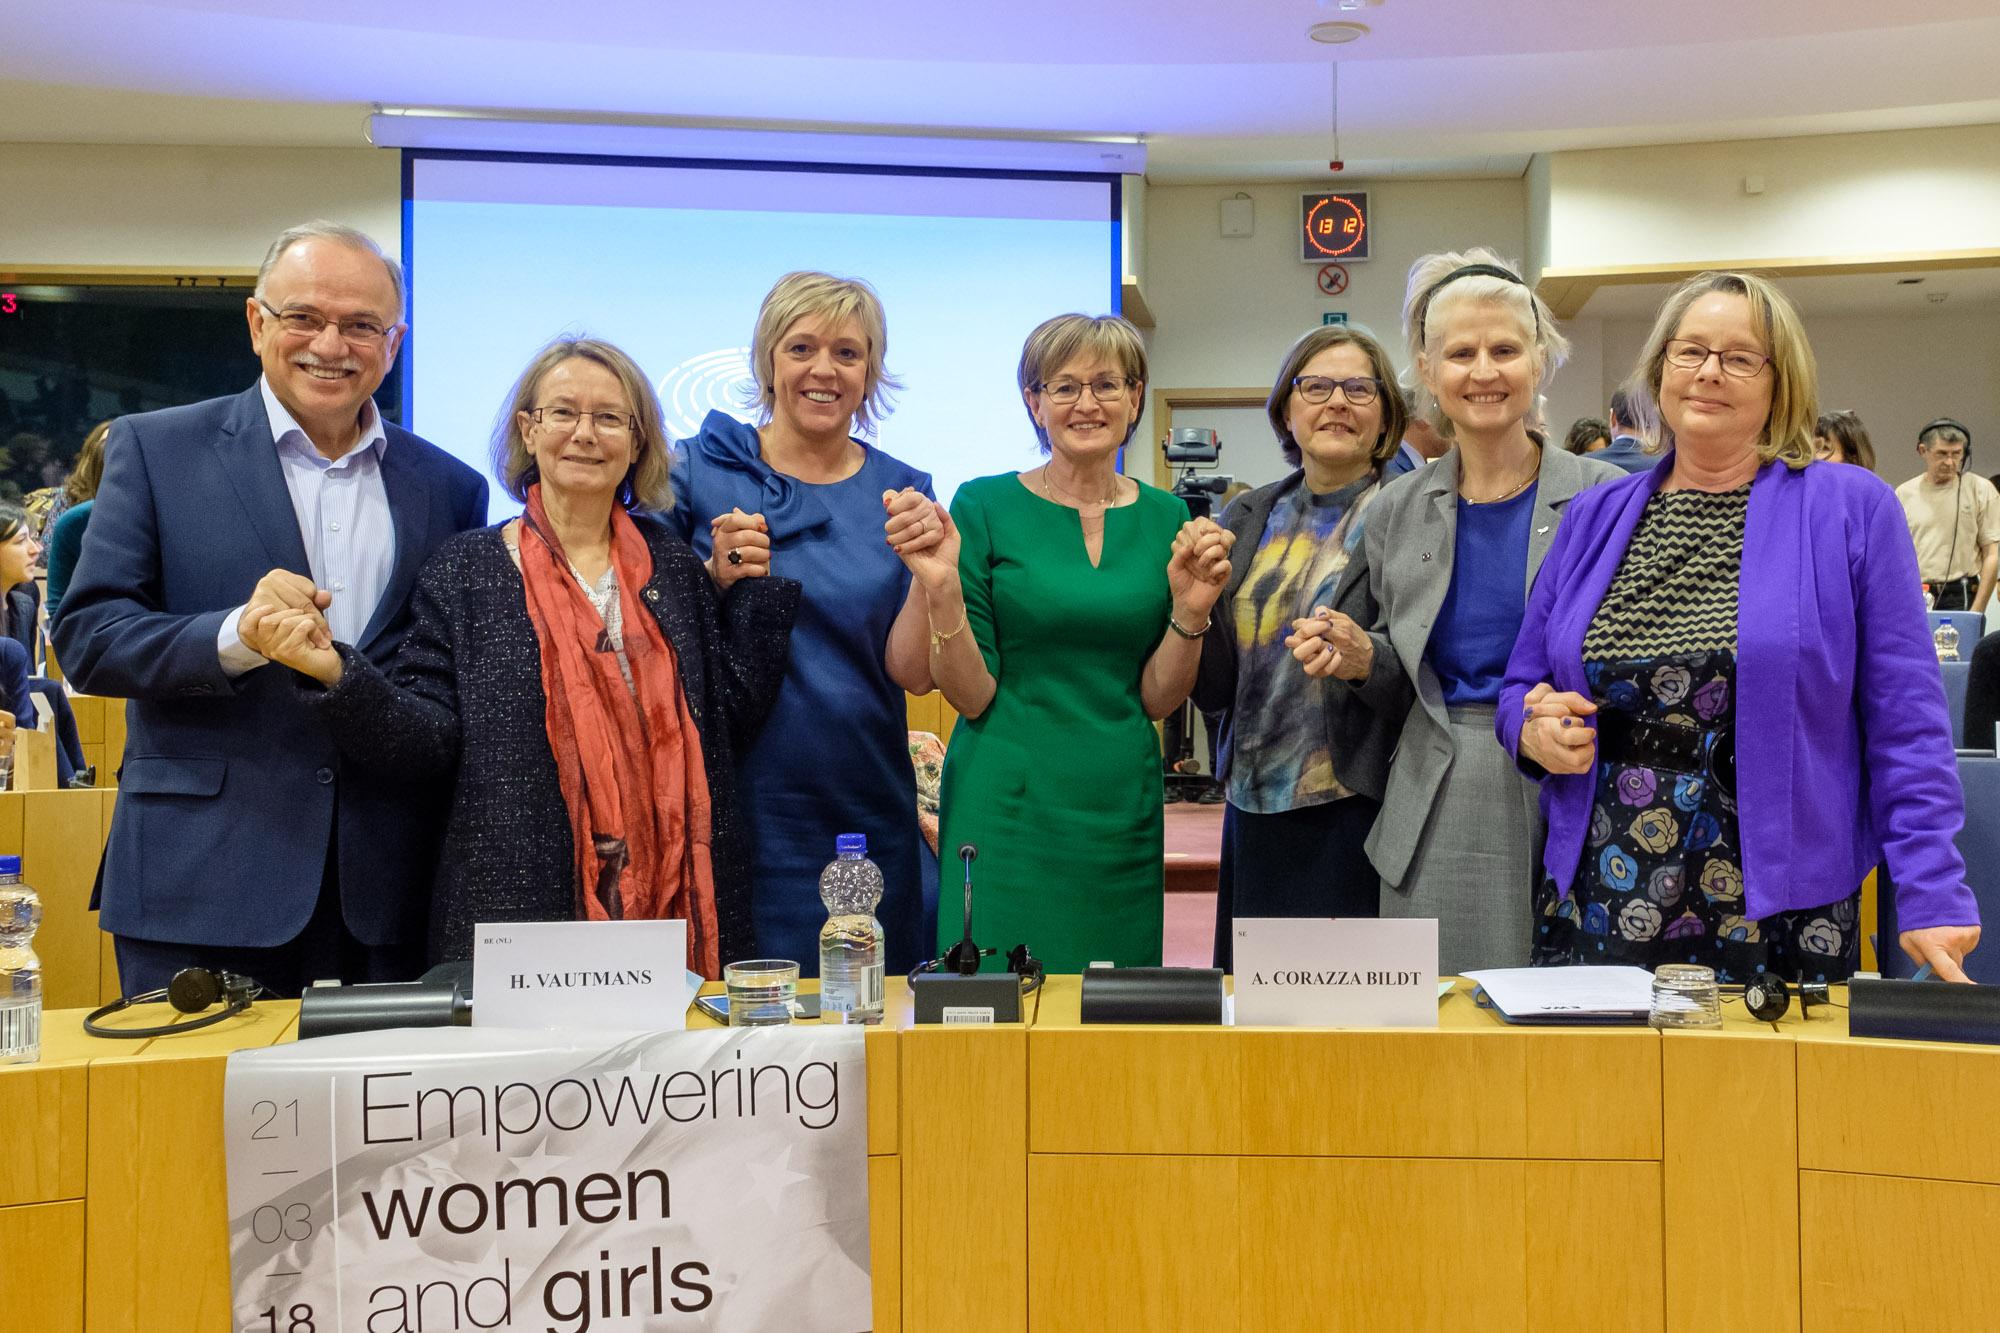 18-03-21 European Women Council-2